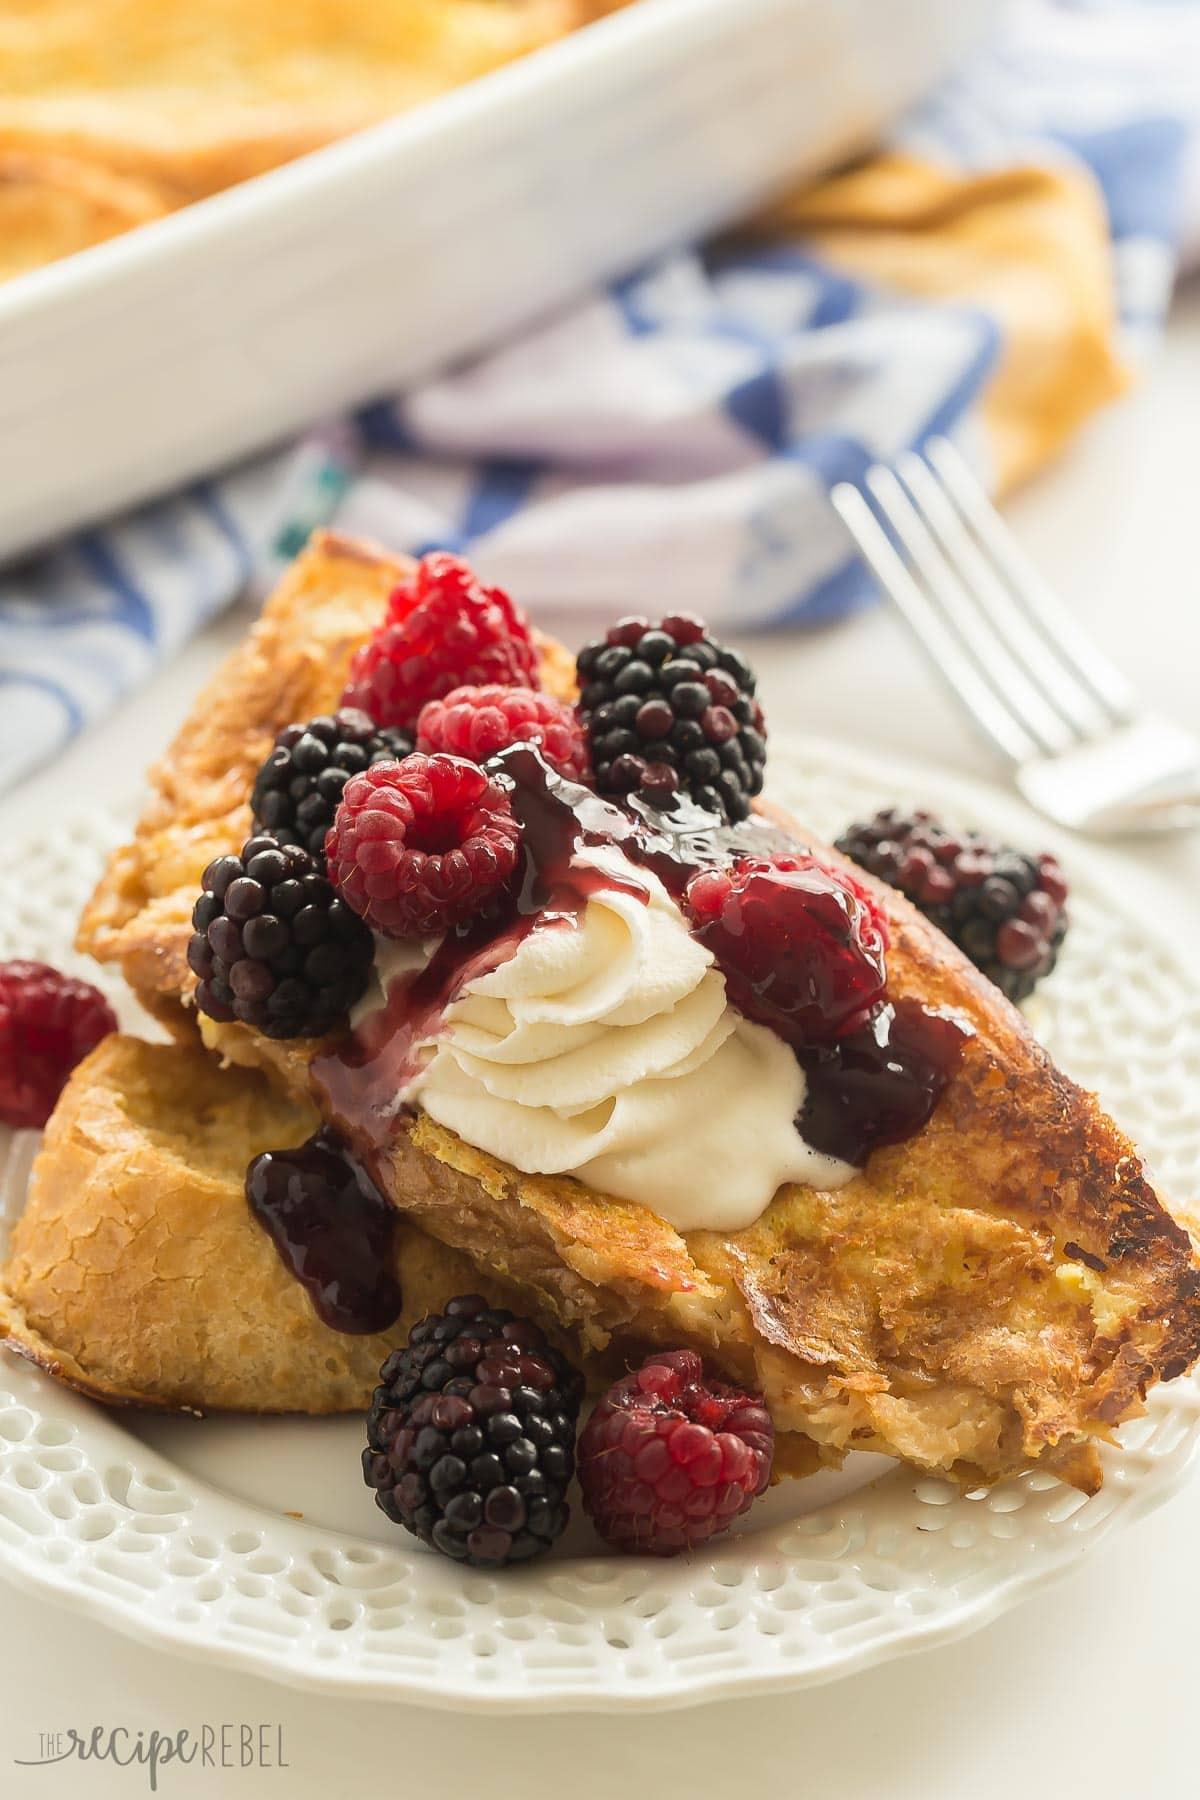 baked-overnight-lemon-french-toast-www-thereciperebel-com-2-of-7